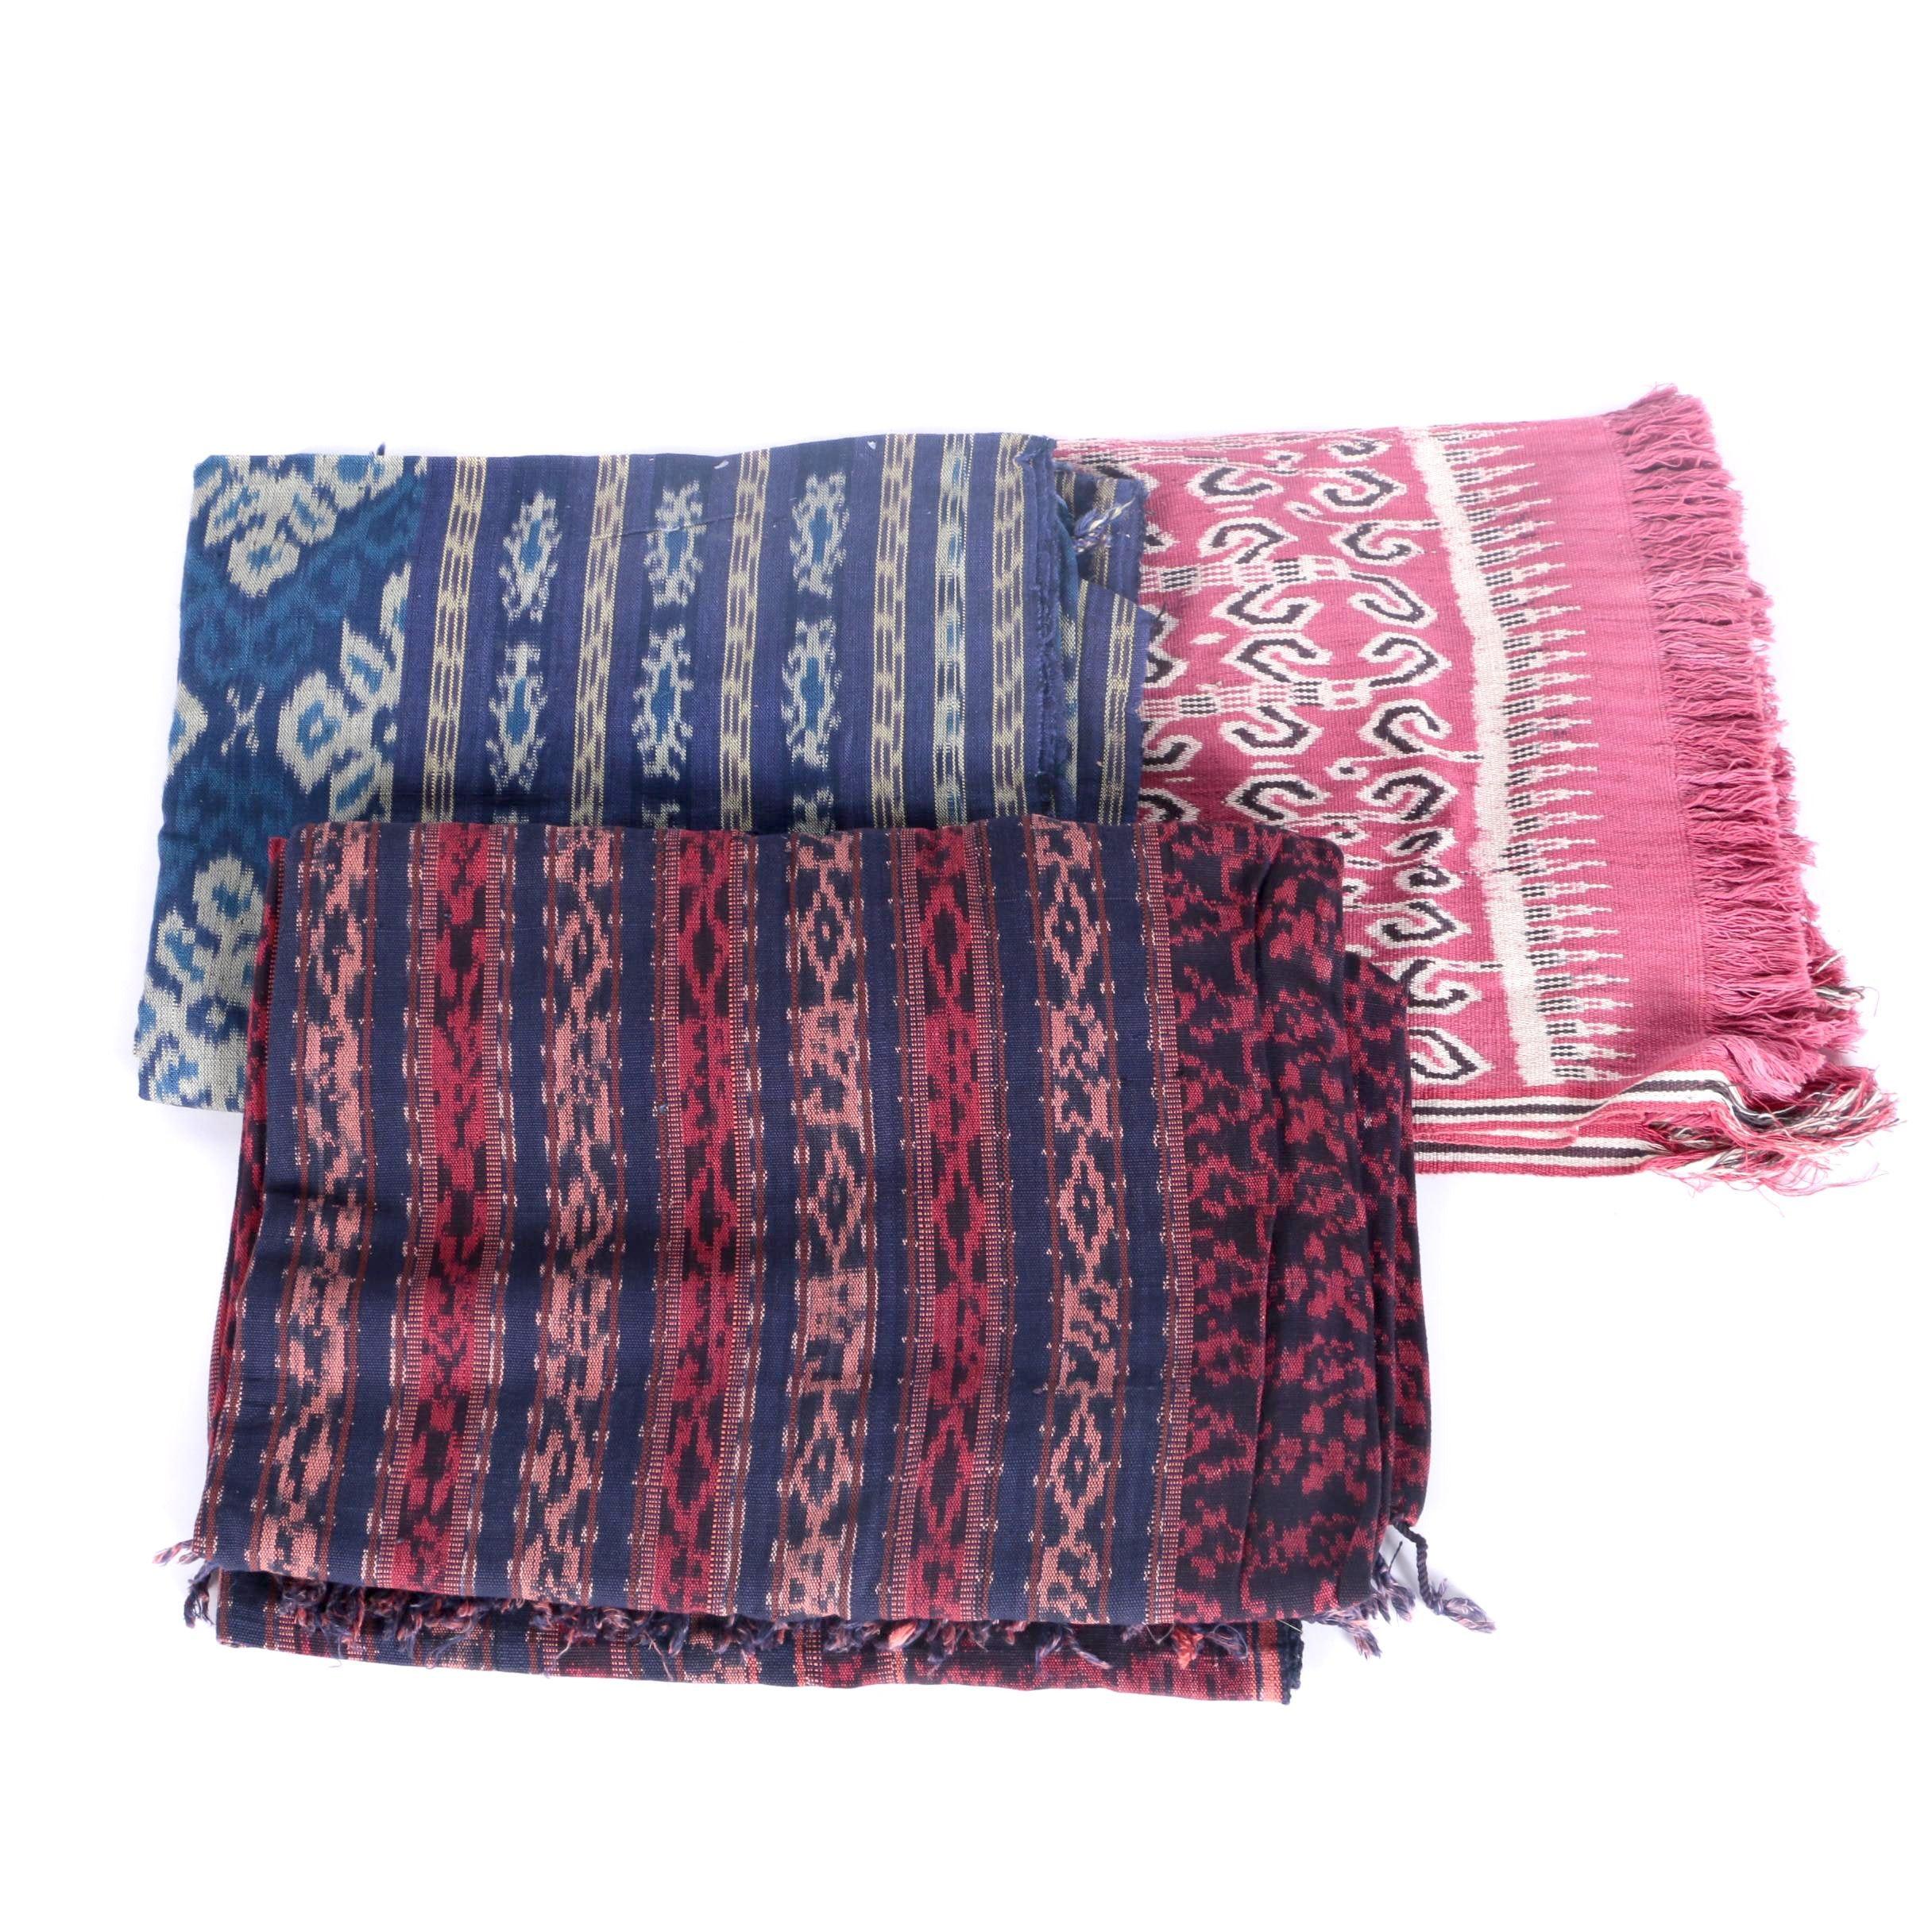 Three Indonesian Textiles